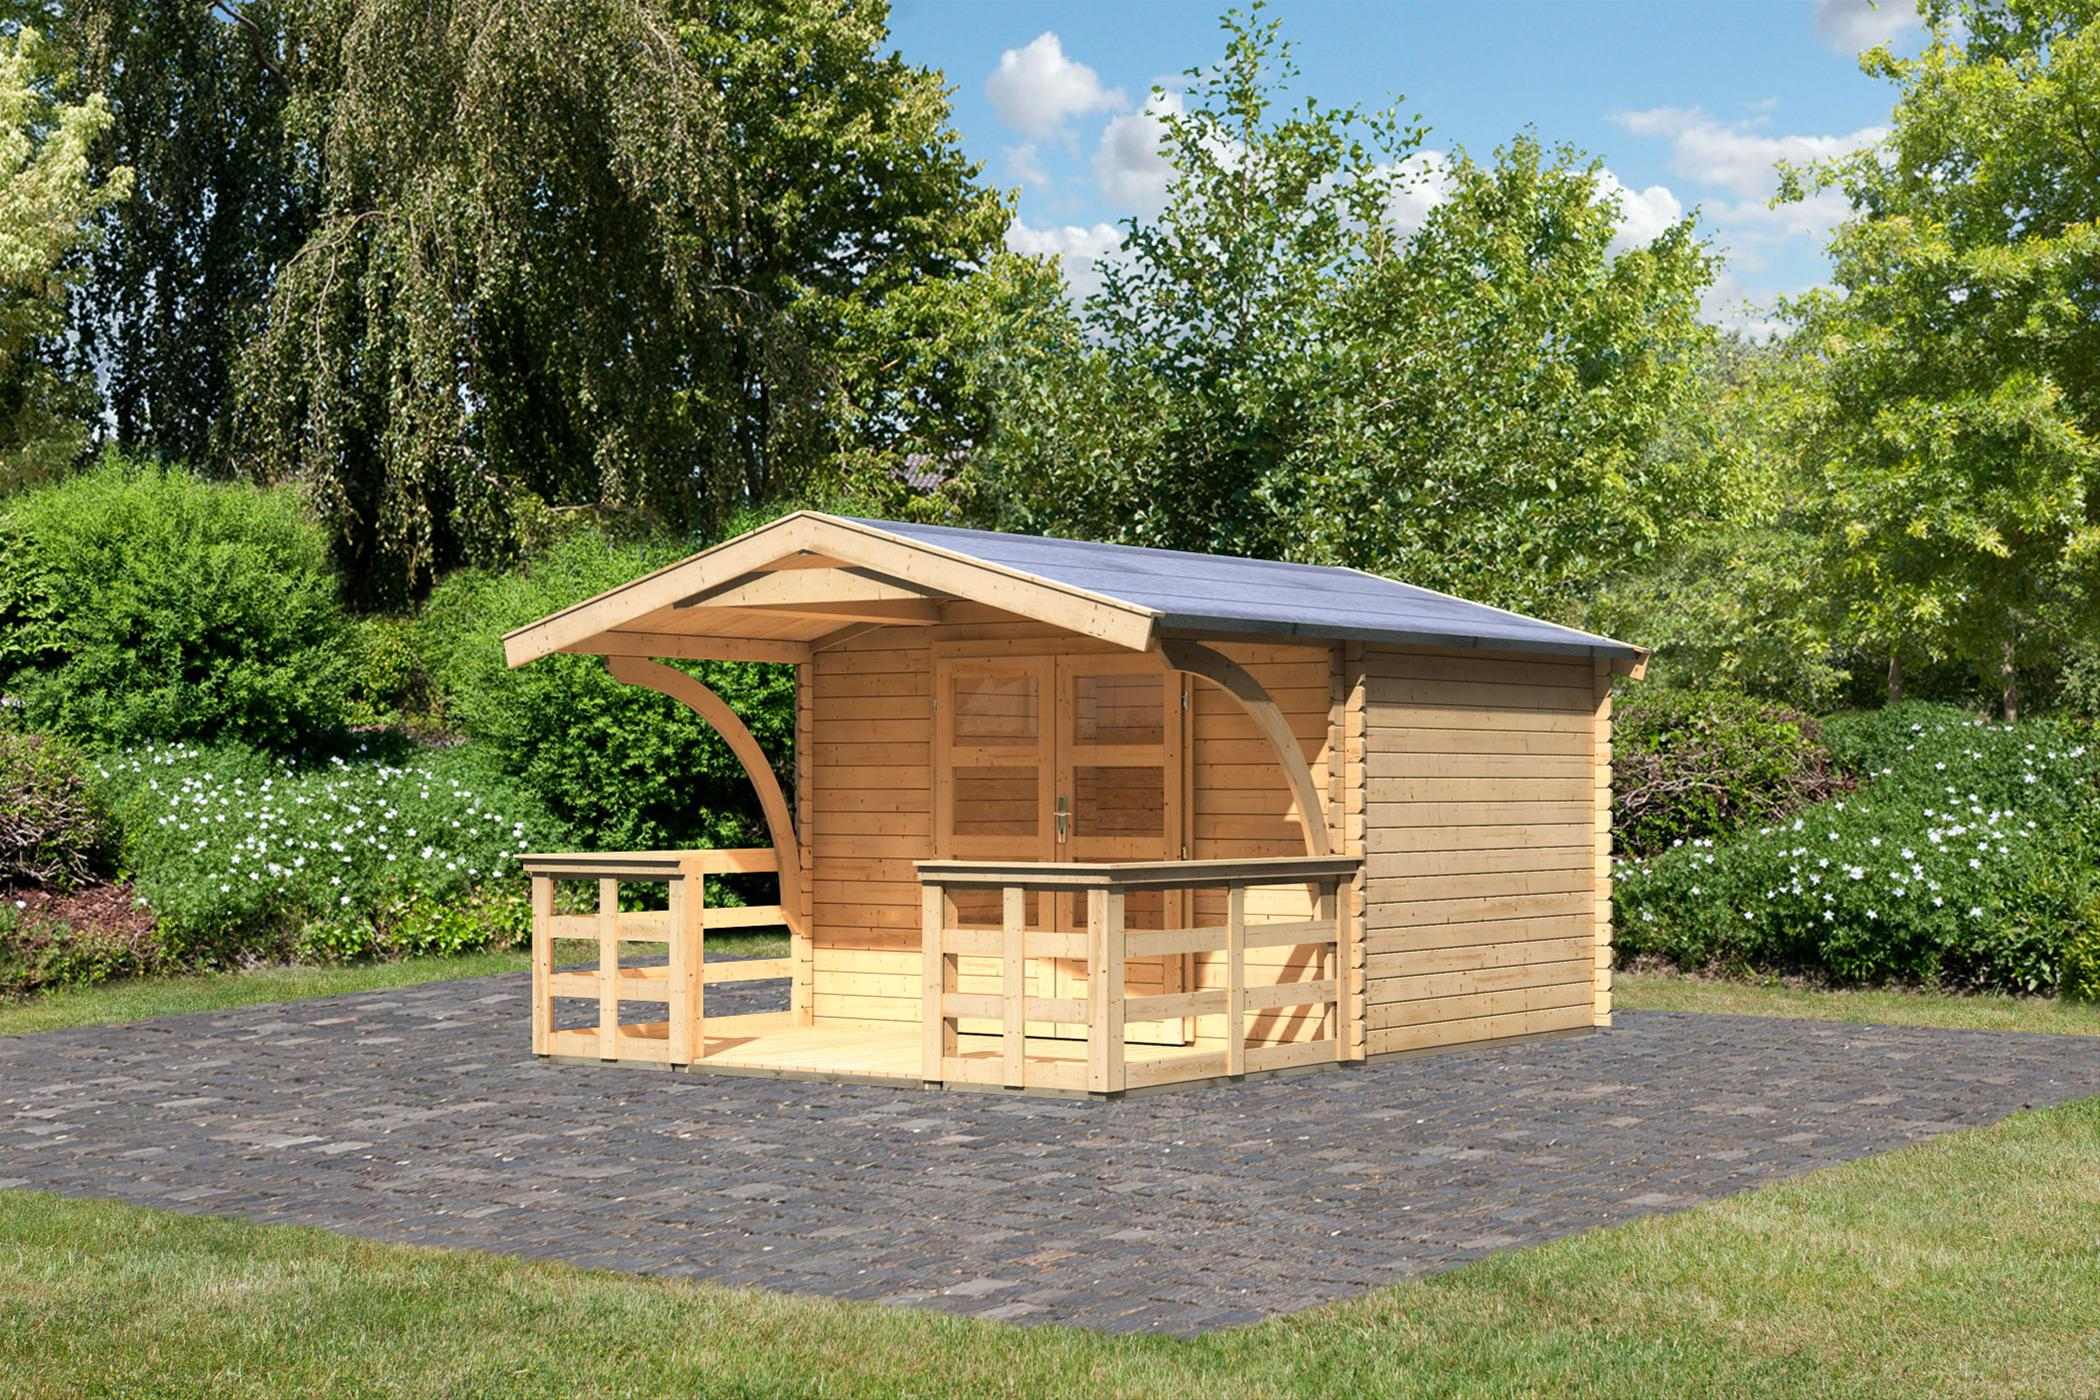 Woodfeeling Gartenhaus 28 mm Bayreuth 3 VD+Terrasse natur 346x456cm Bild 1